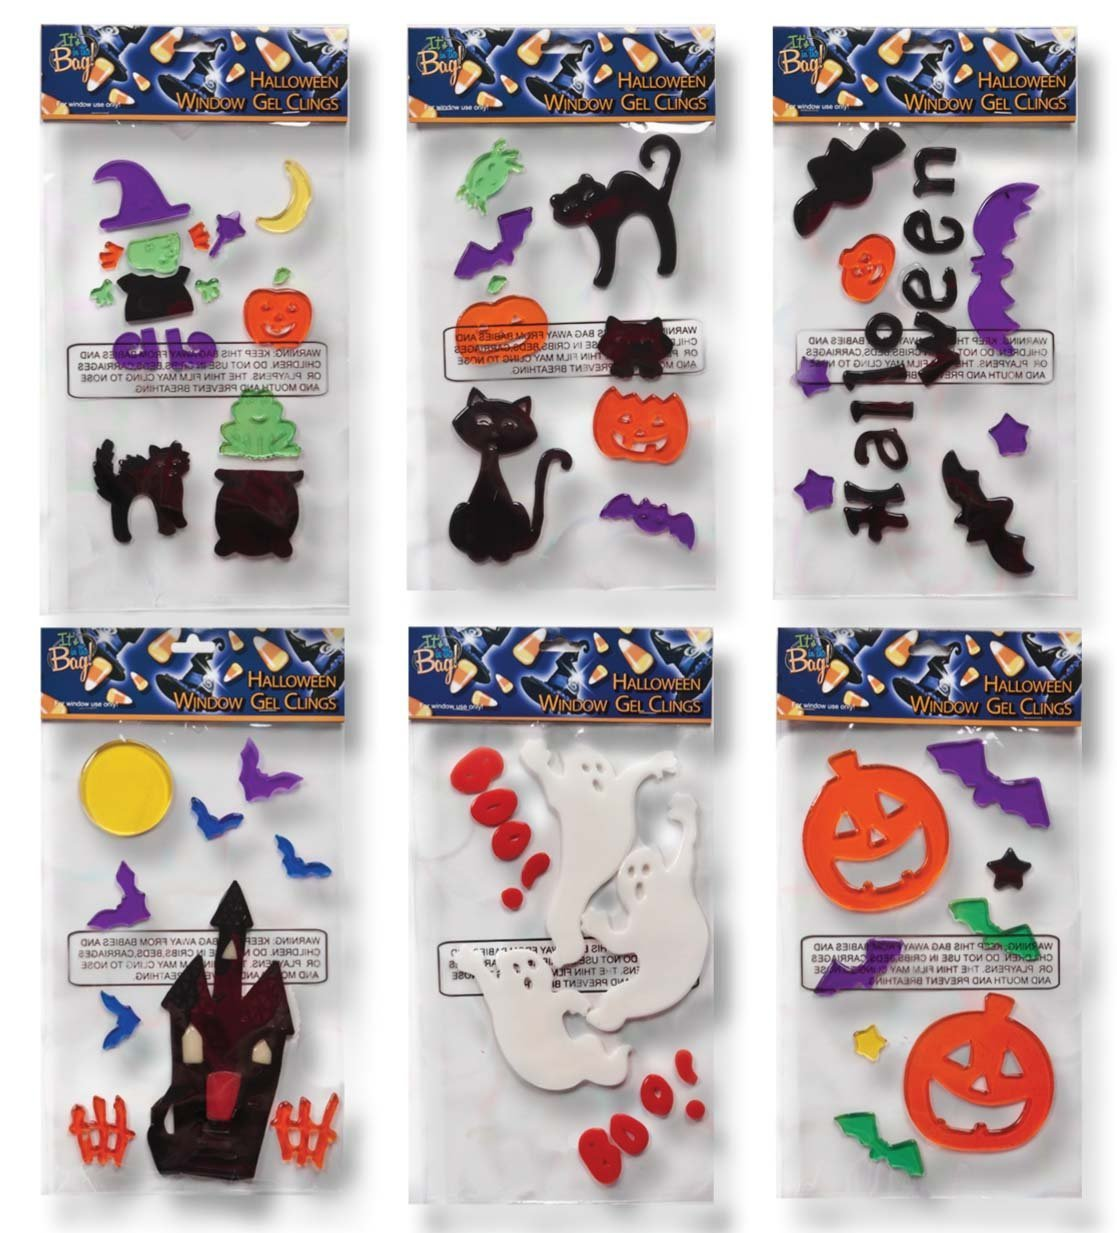 6 halloween window gel clings only $13.95 (reg. $25) – sisters